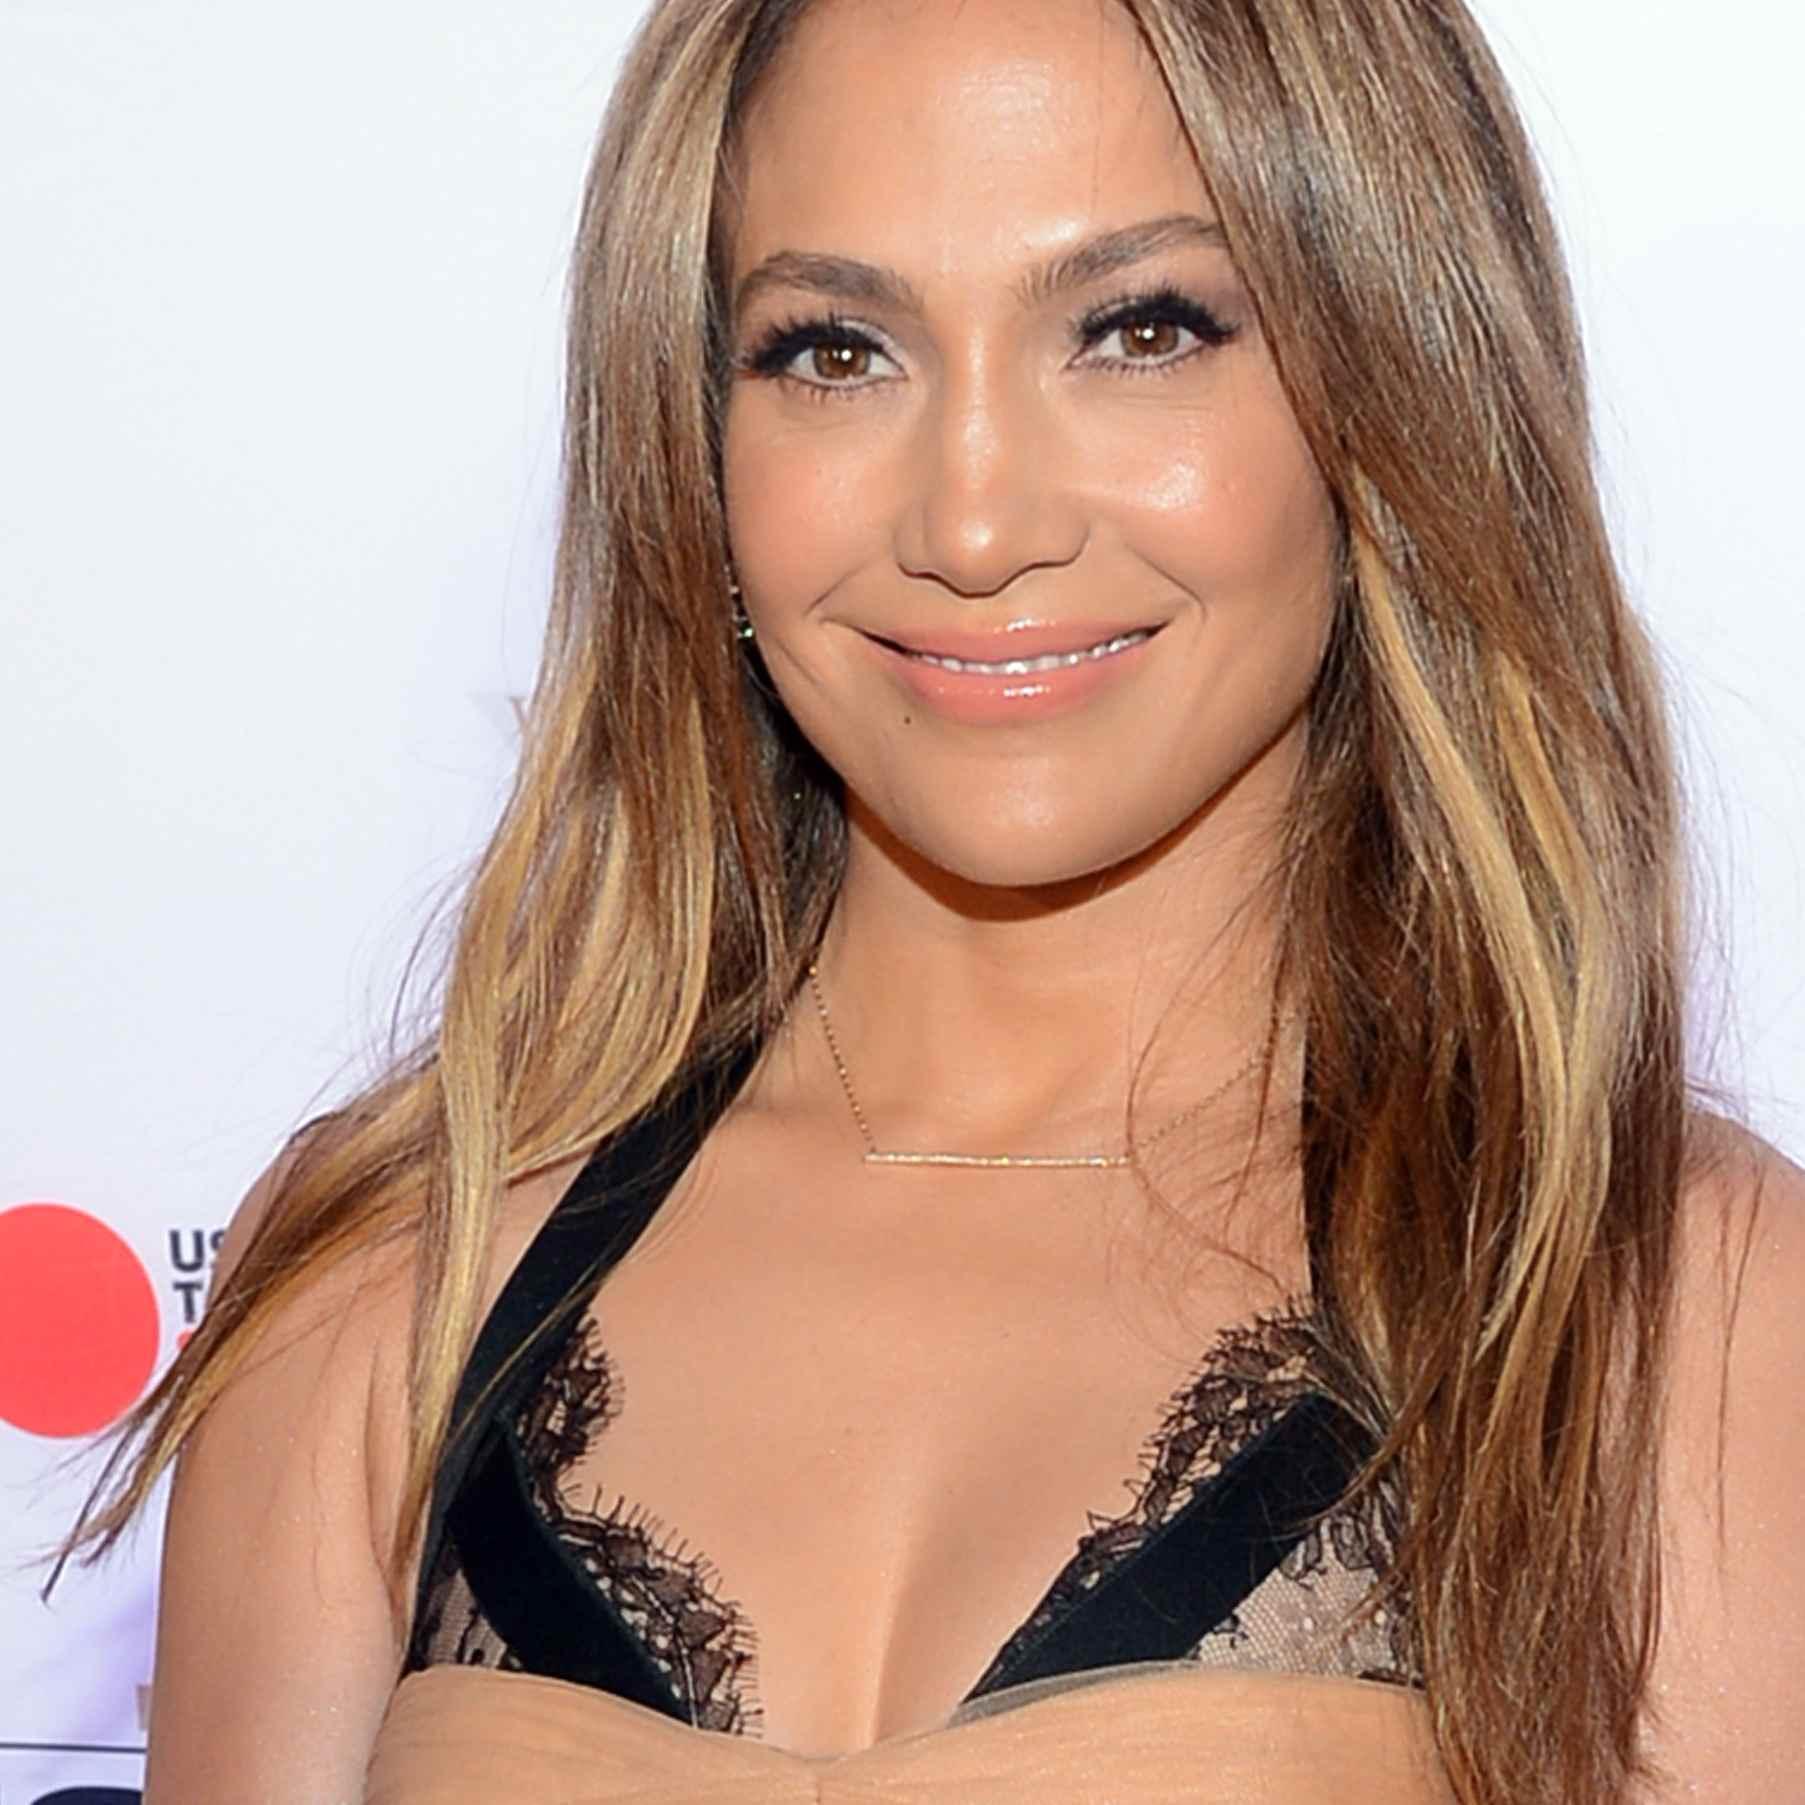 Jennifer Lopez in March 2013 at age 43